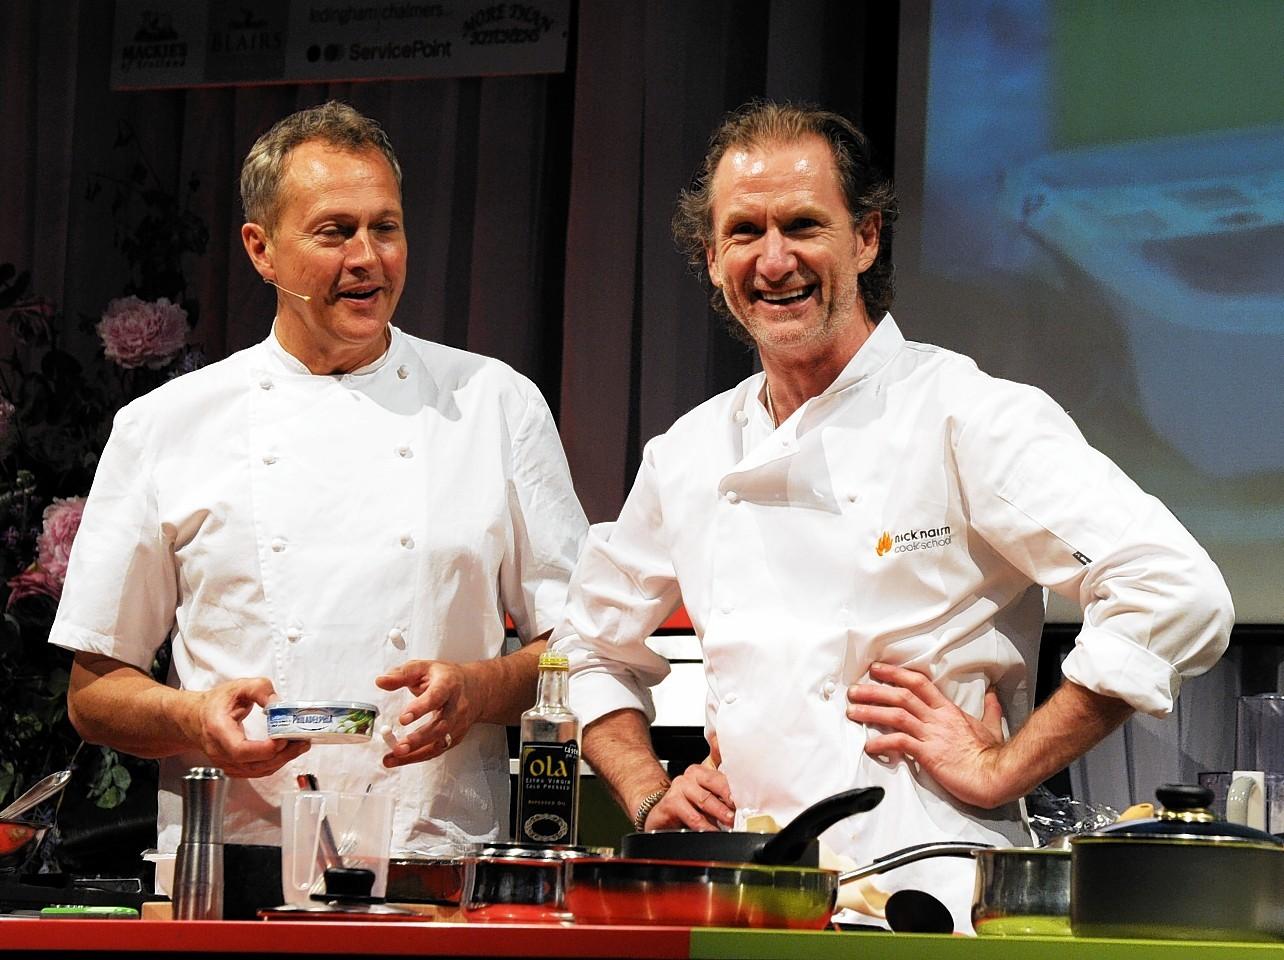 Nick Nairn and Paul Rankin at Taste of Grampian 2014